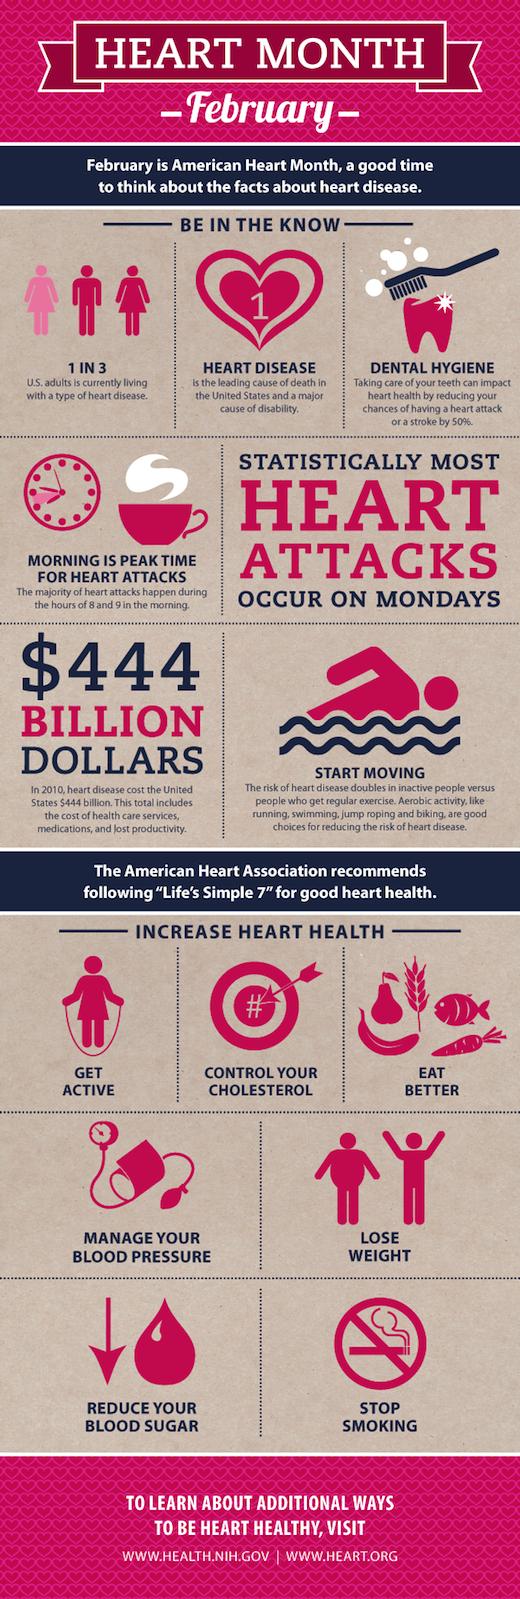 heart health infographic pediatric dentist Valparaiso